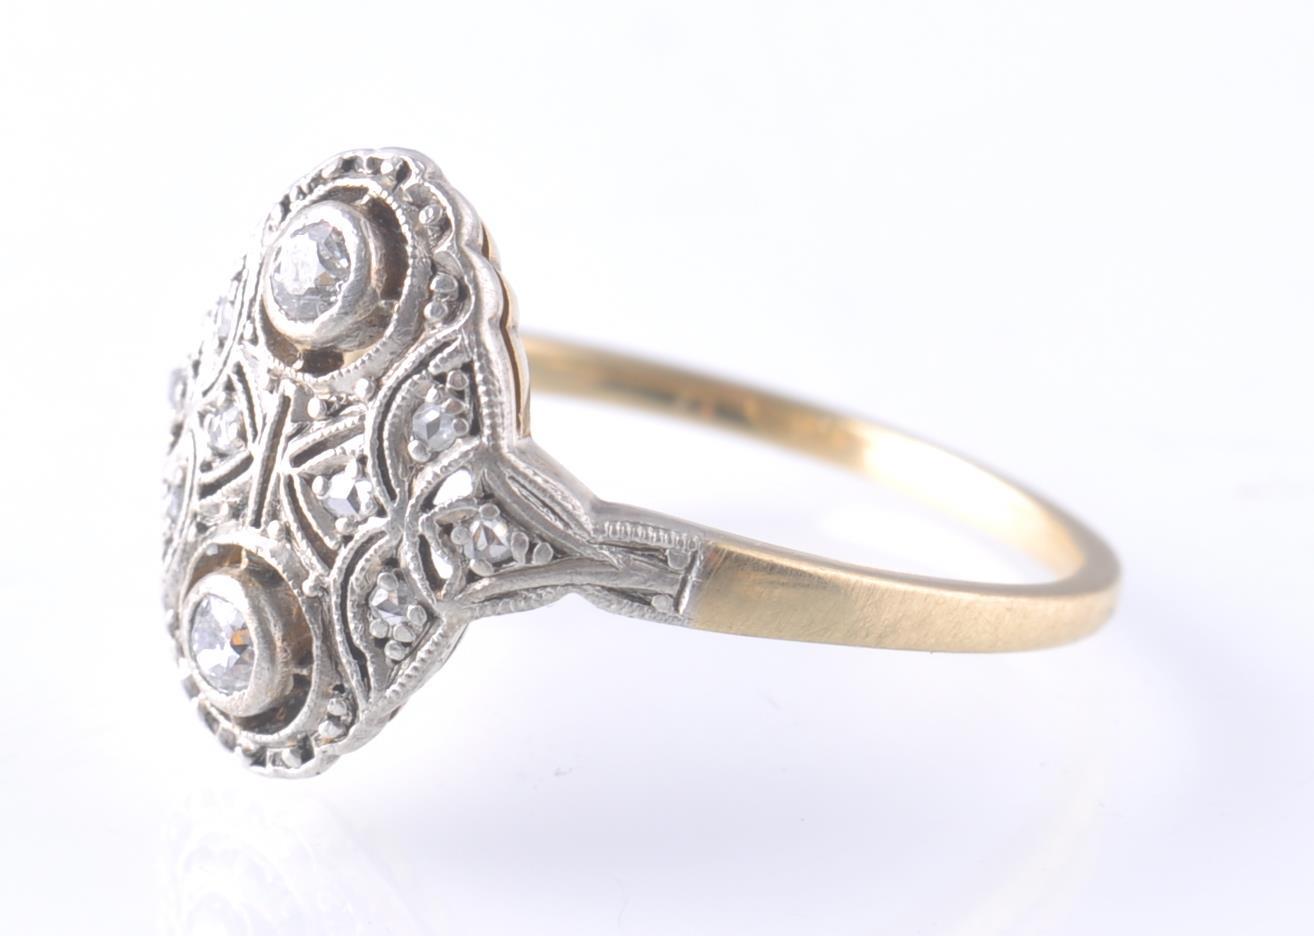 Lot 108 - AN 18CT GOLD & PLATINUM ART DECO DIAMOND RING